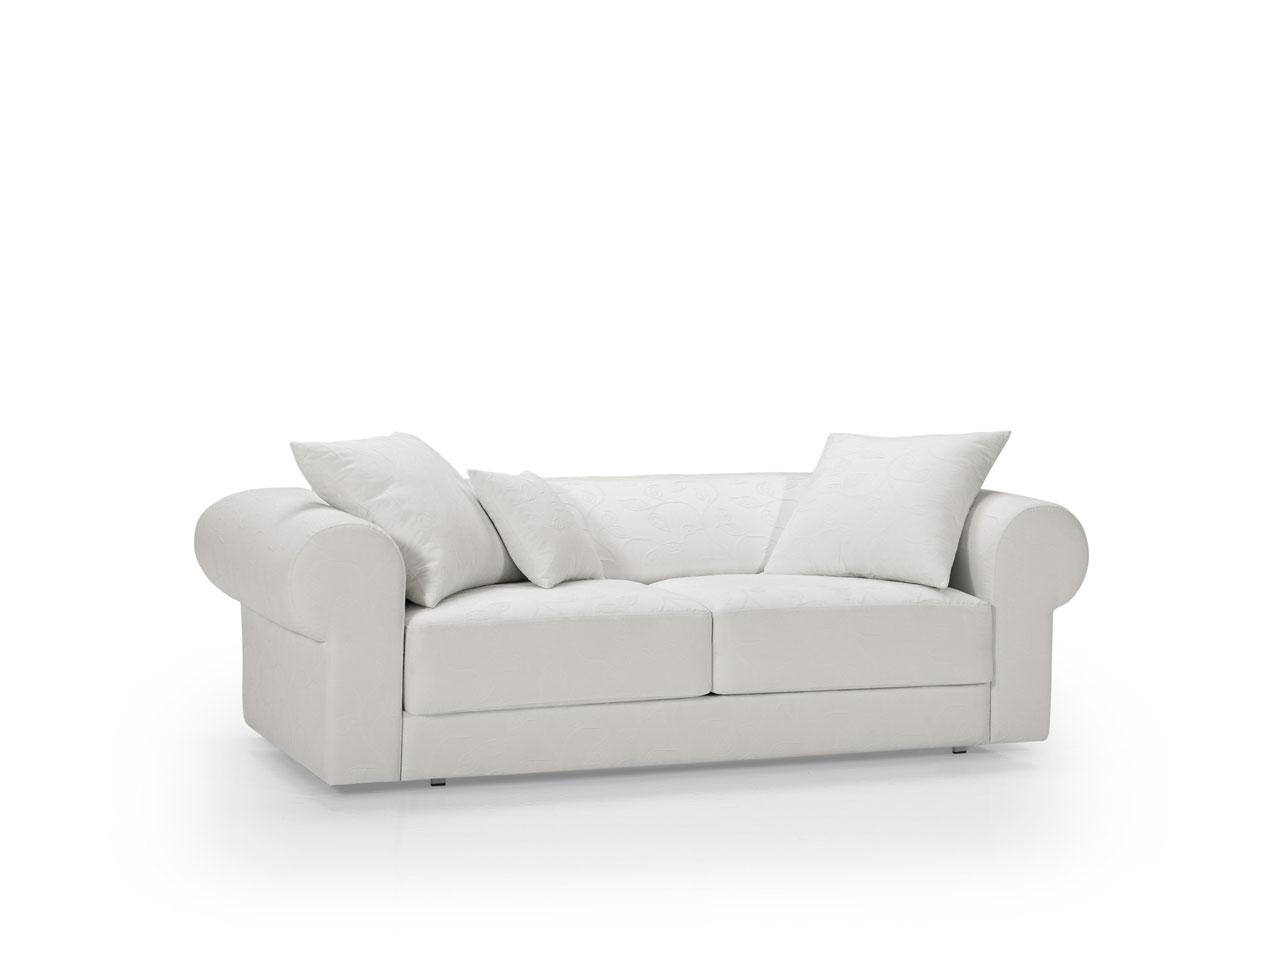 Comprar sof s de dise o online la mesa de centro - Compra sofas online ...